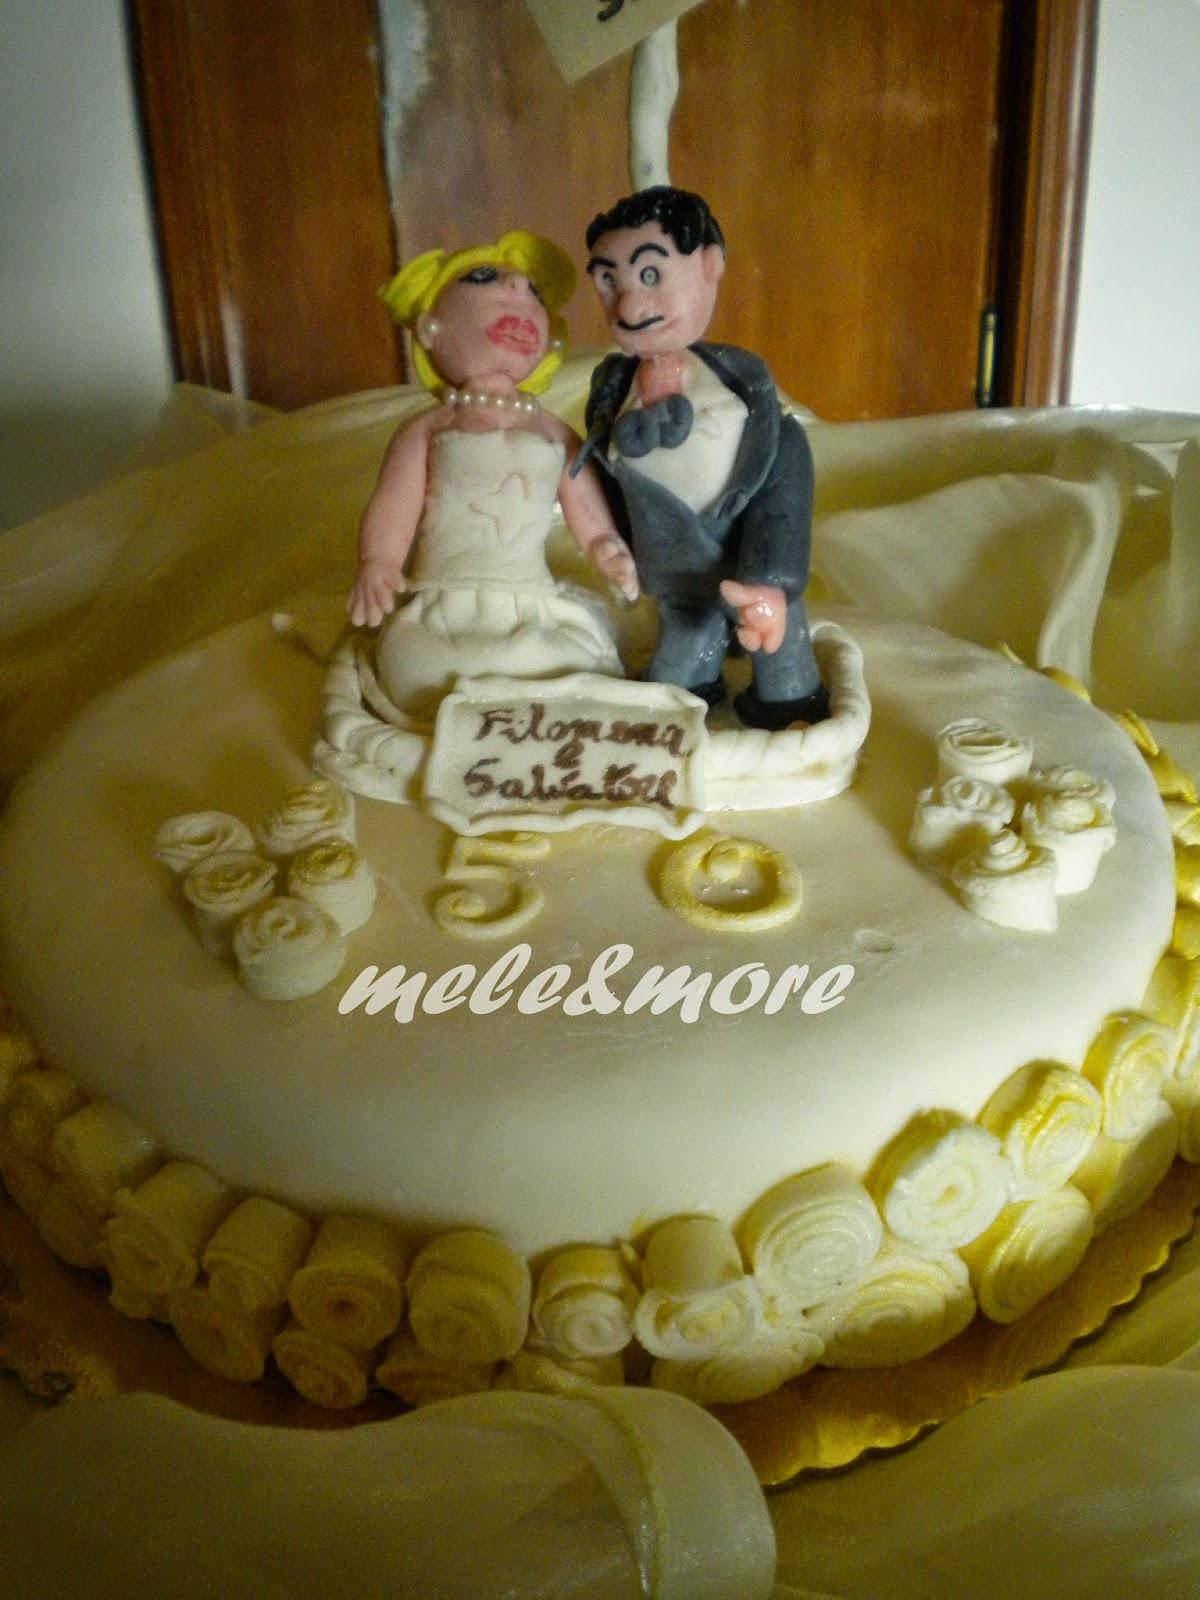 Mele more torta 50 anni insieme for Decorazioni per torta 60 anni